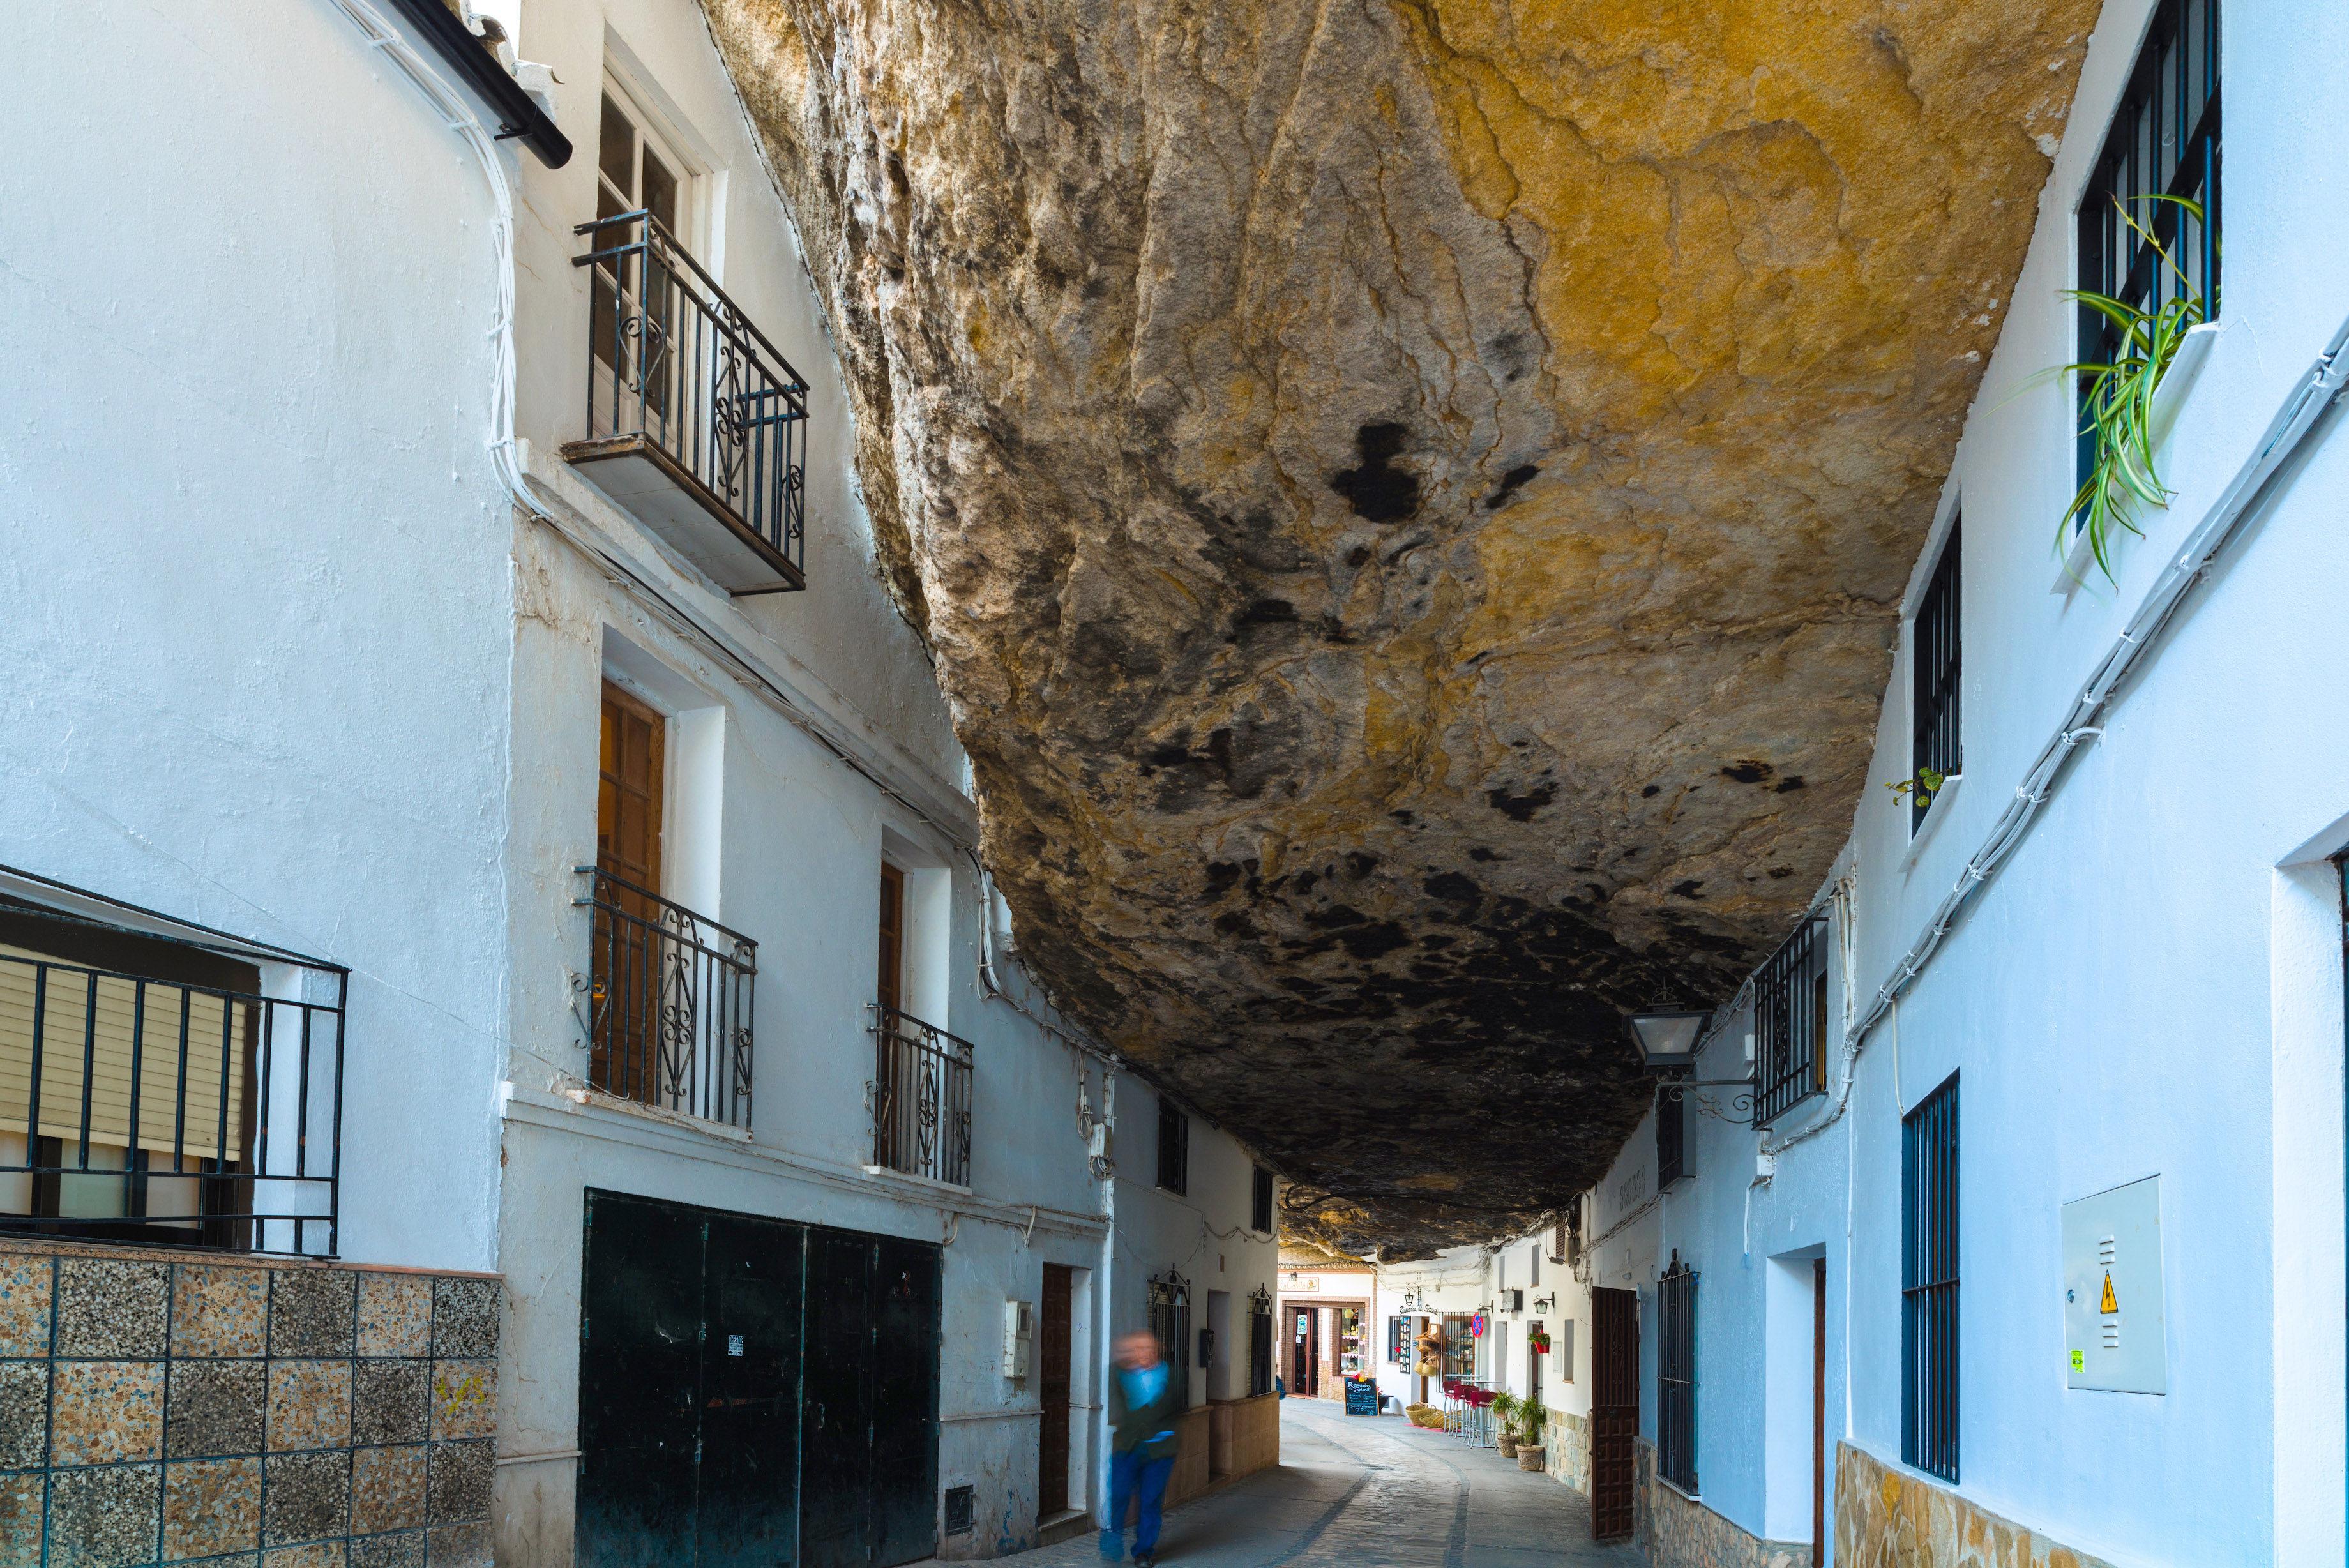 Turismo rural en setenil de las bodegas - Fotos de bodegas en casas particulares ...